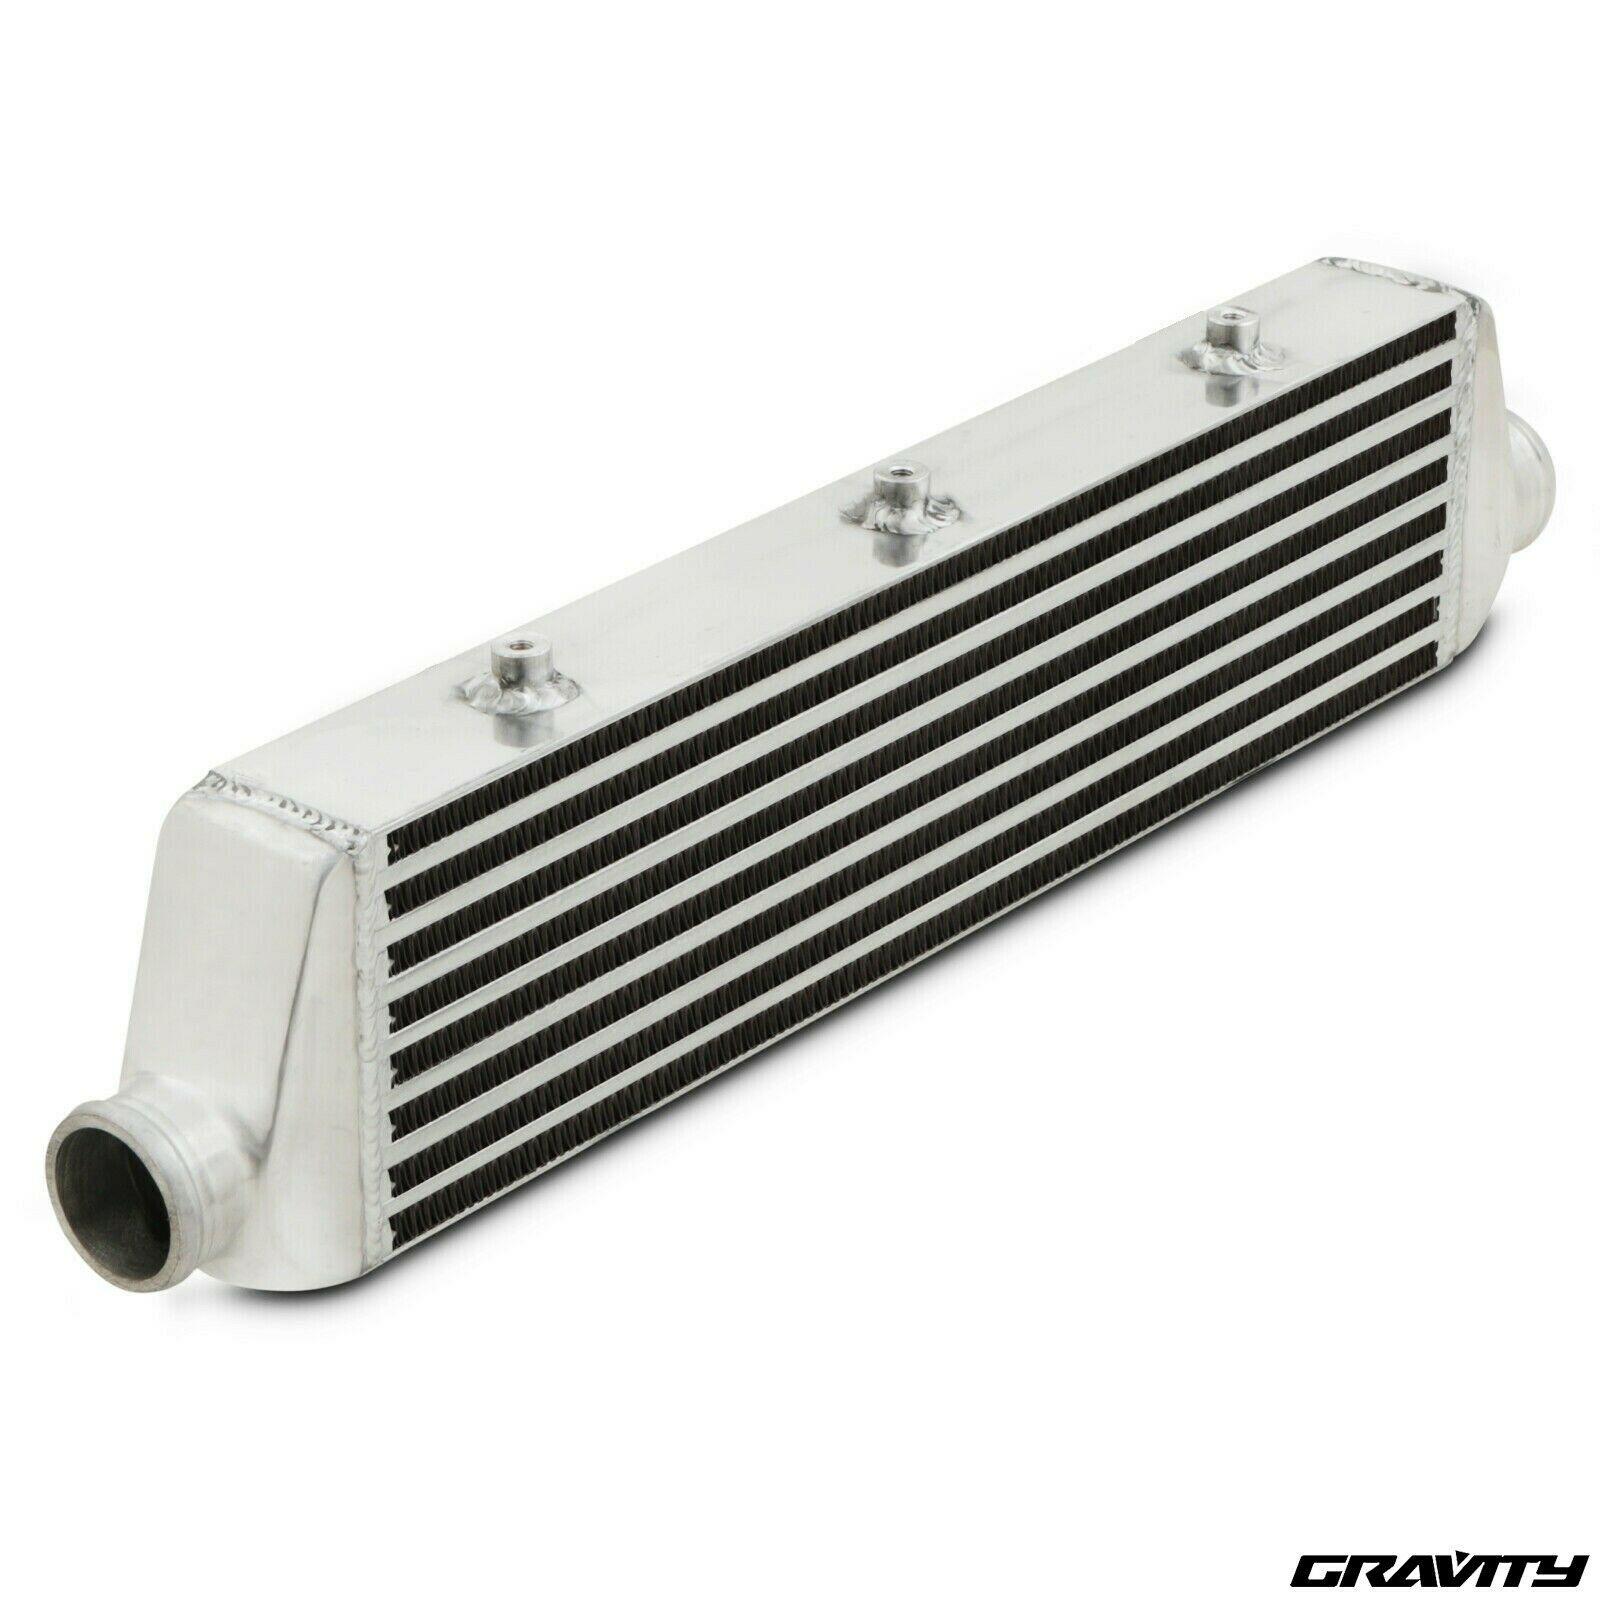 550x140x65mm intercooler (Civic, Swift, Astra, Calibra, VW 1.9 TDi) 63mm csatlakozásokkal MGP Racing